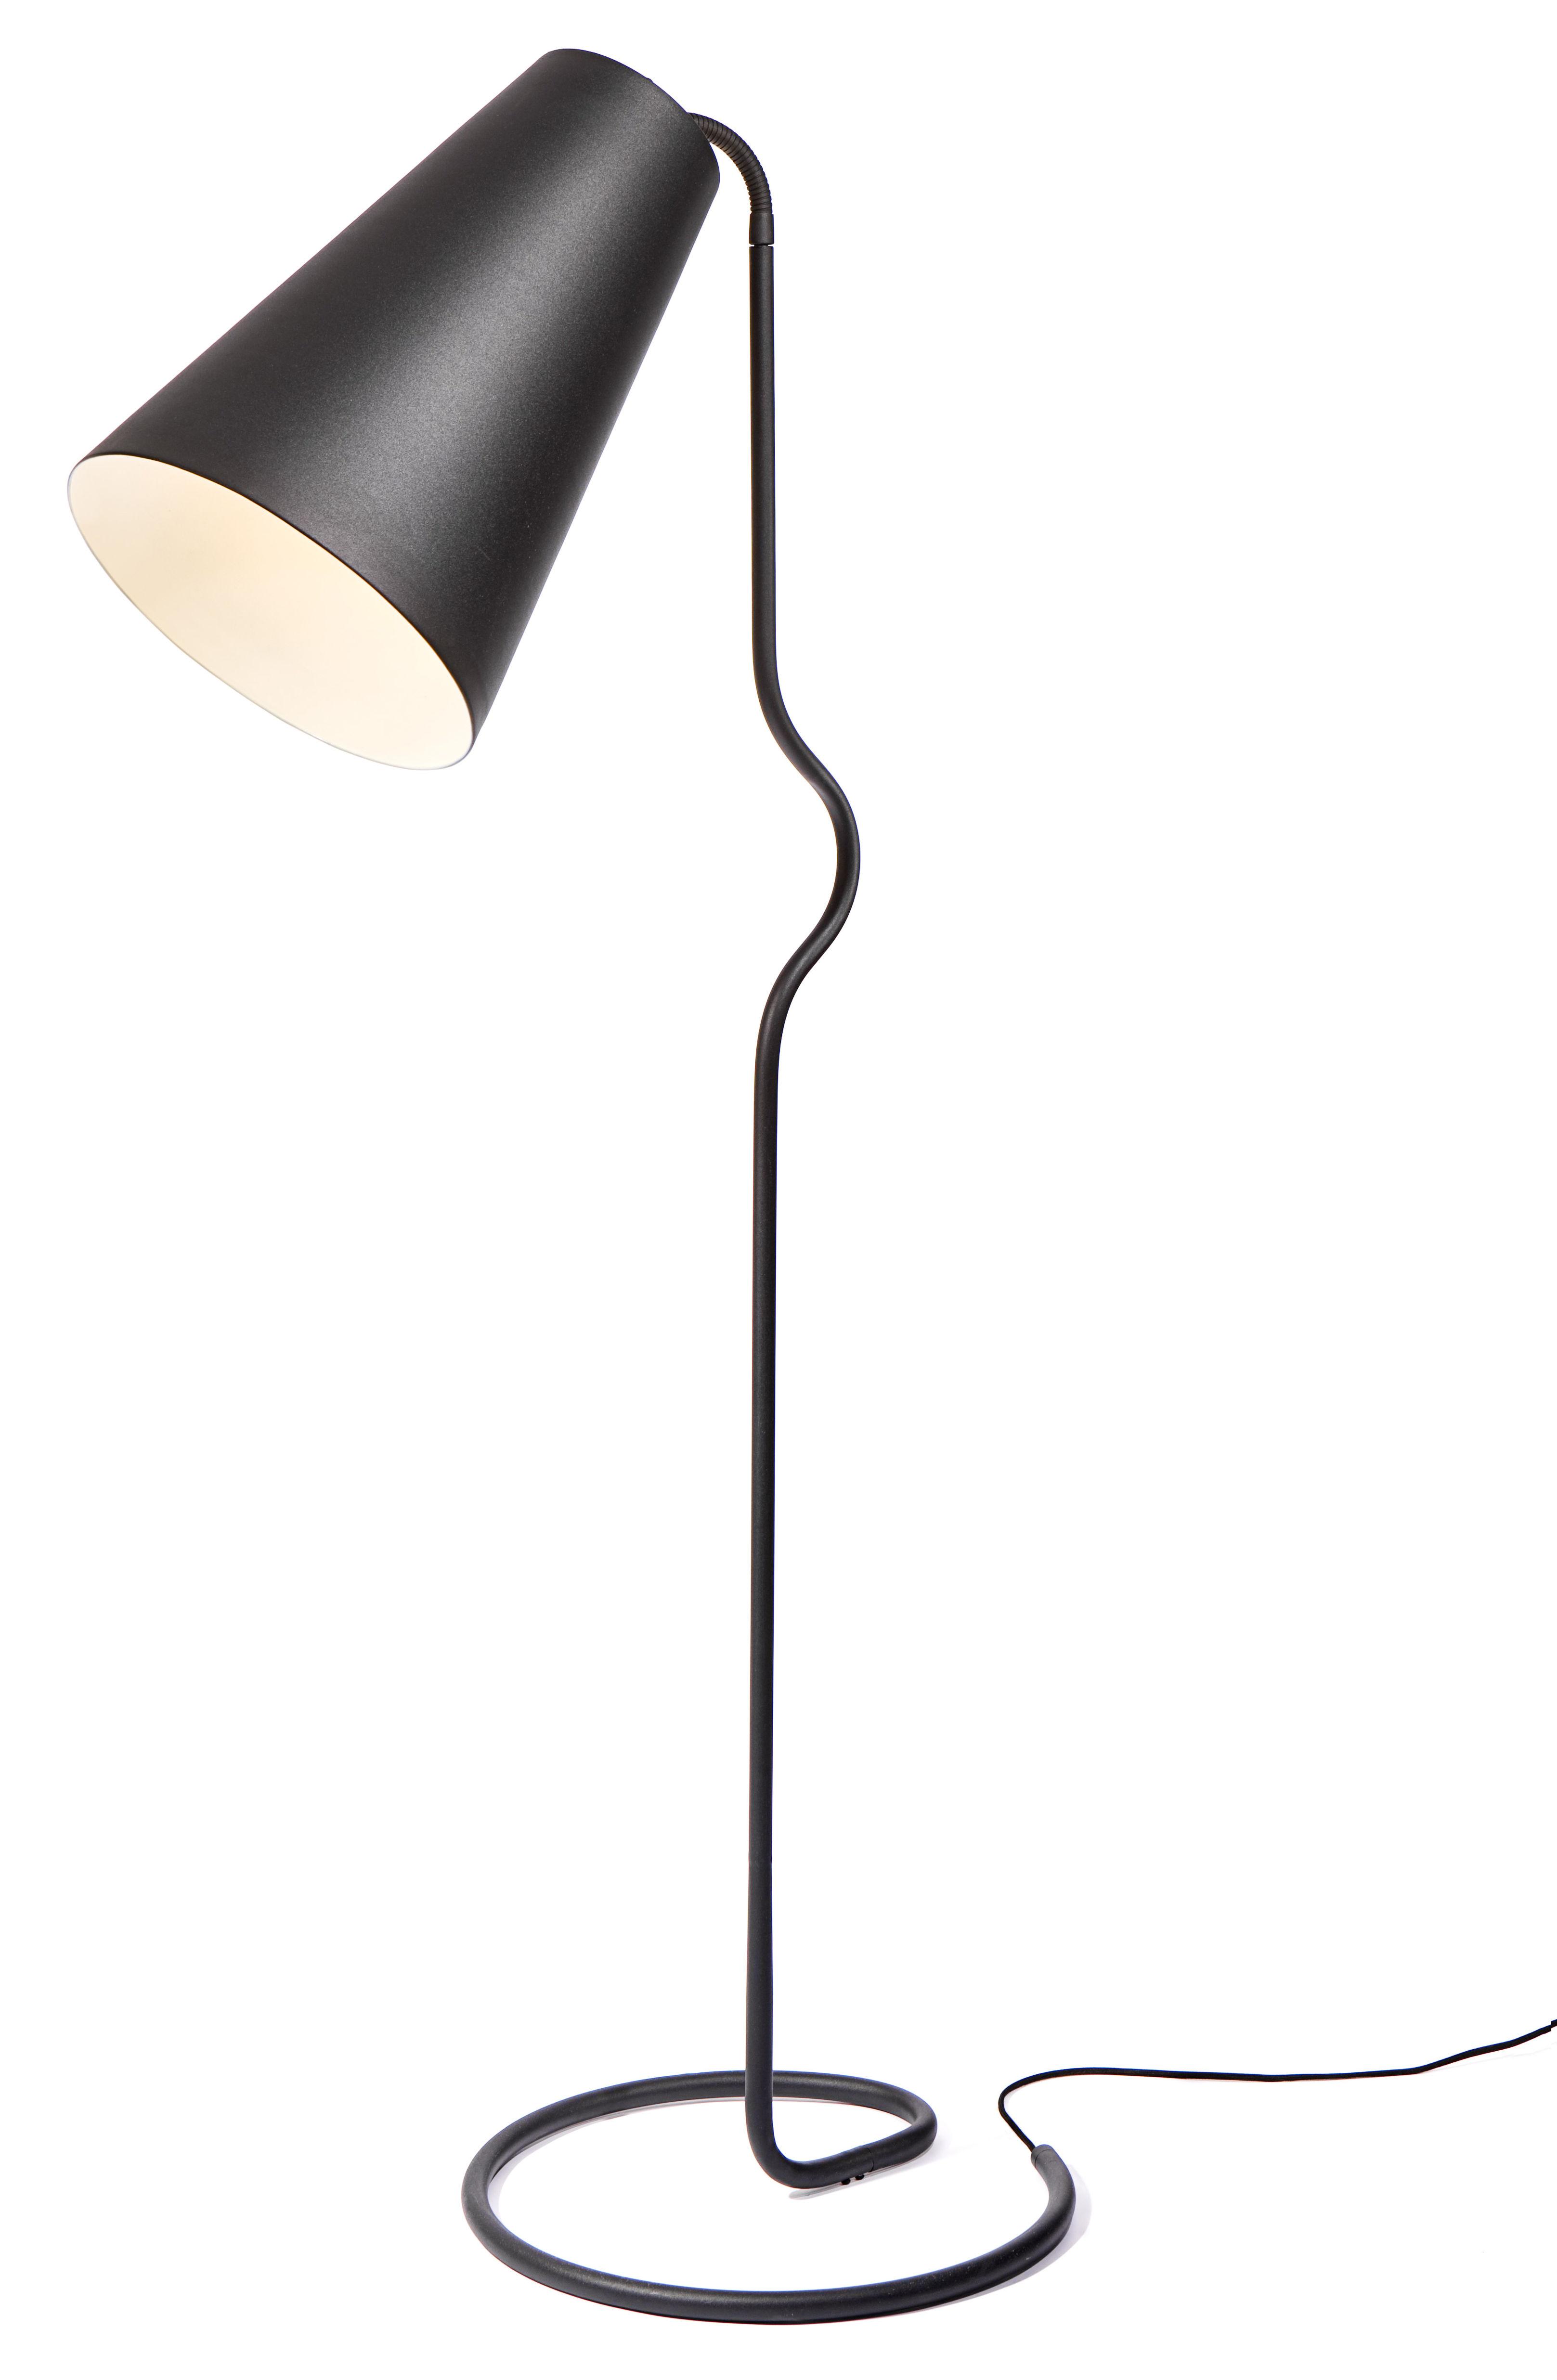 Luminaire - Lampadaires - Lampadaire Bender - Northern  - Noir - Acier, Aluminium